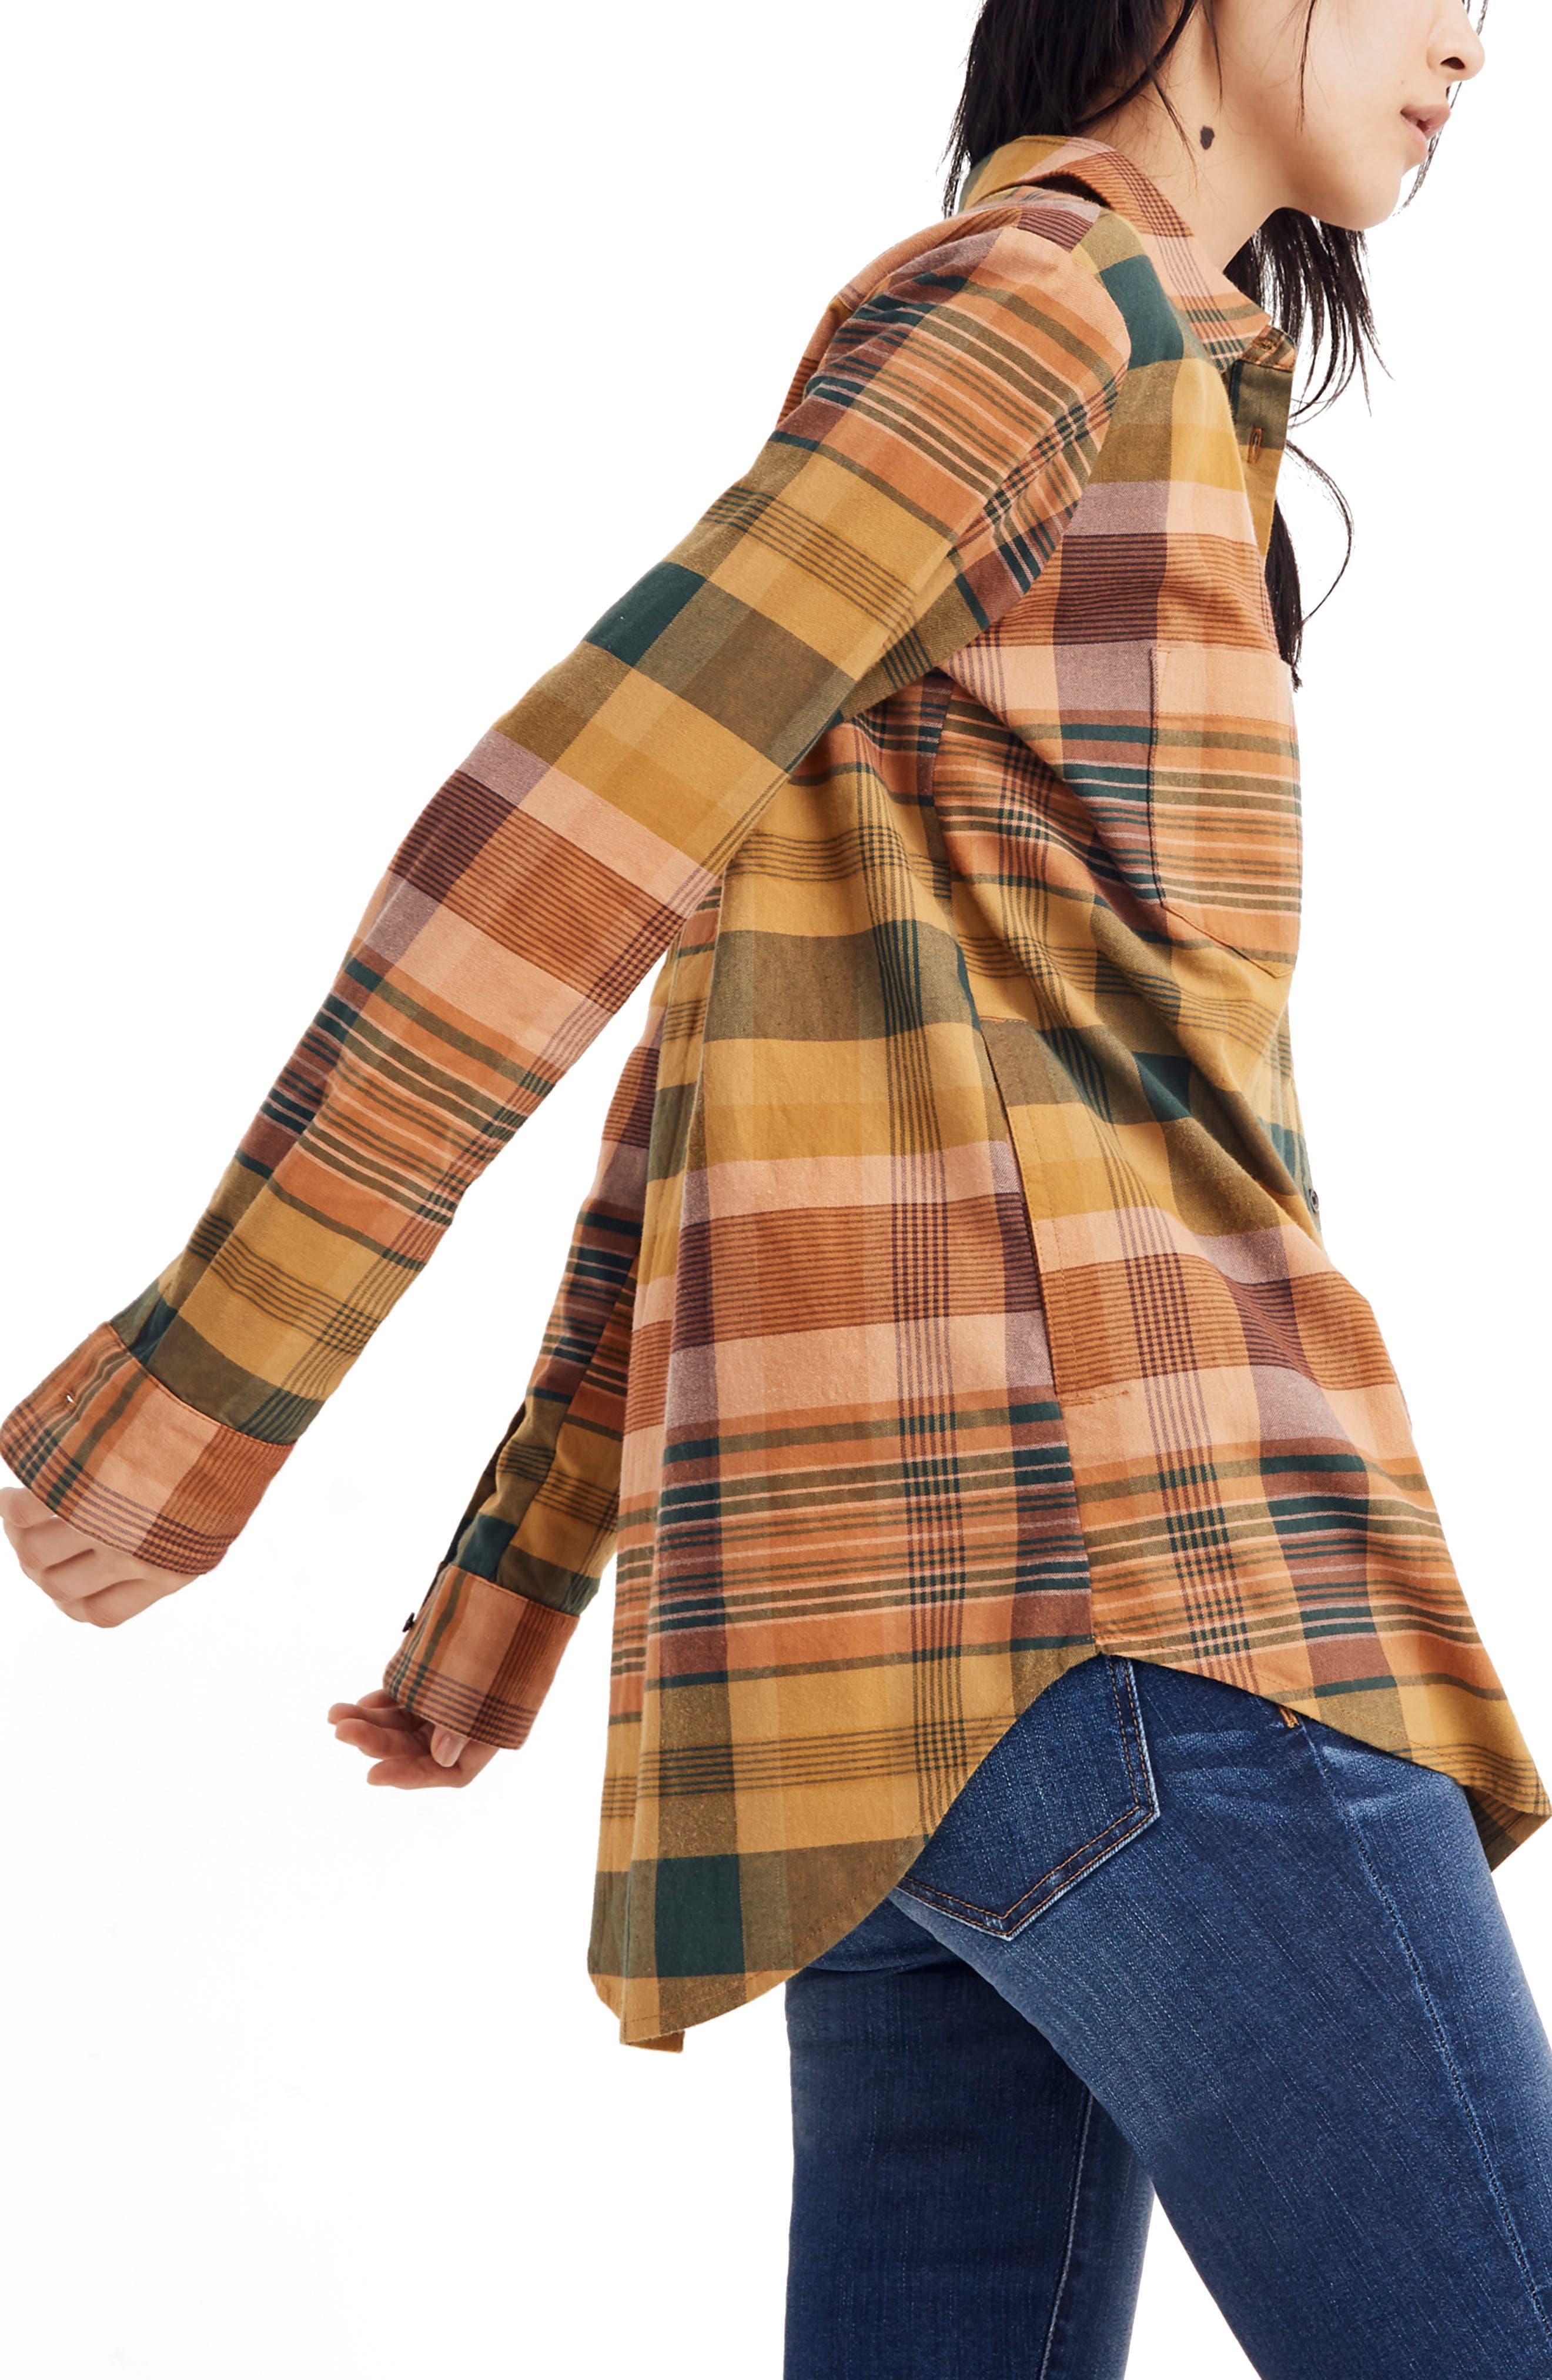 Seconda Plaid Sunday Flannel Shirt,                             Alternate thumbnail 3, color,                             EGYPTIAN GOLD